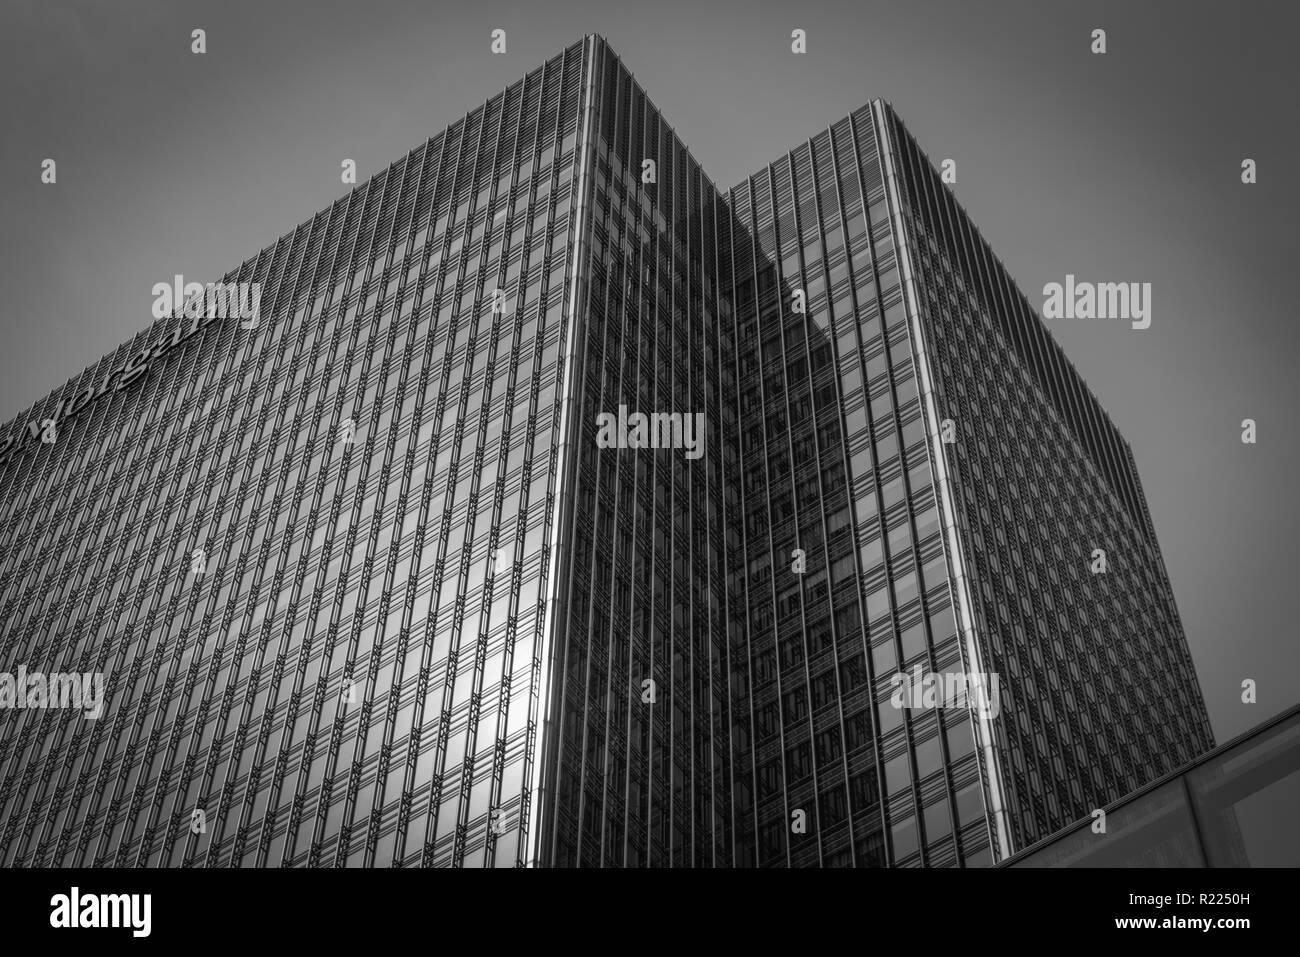 Canary Wharf. - Stock Image